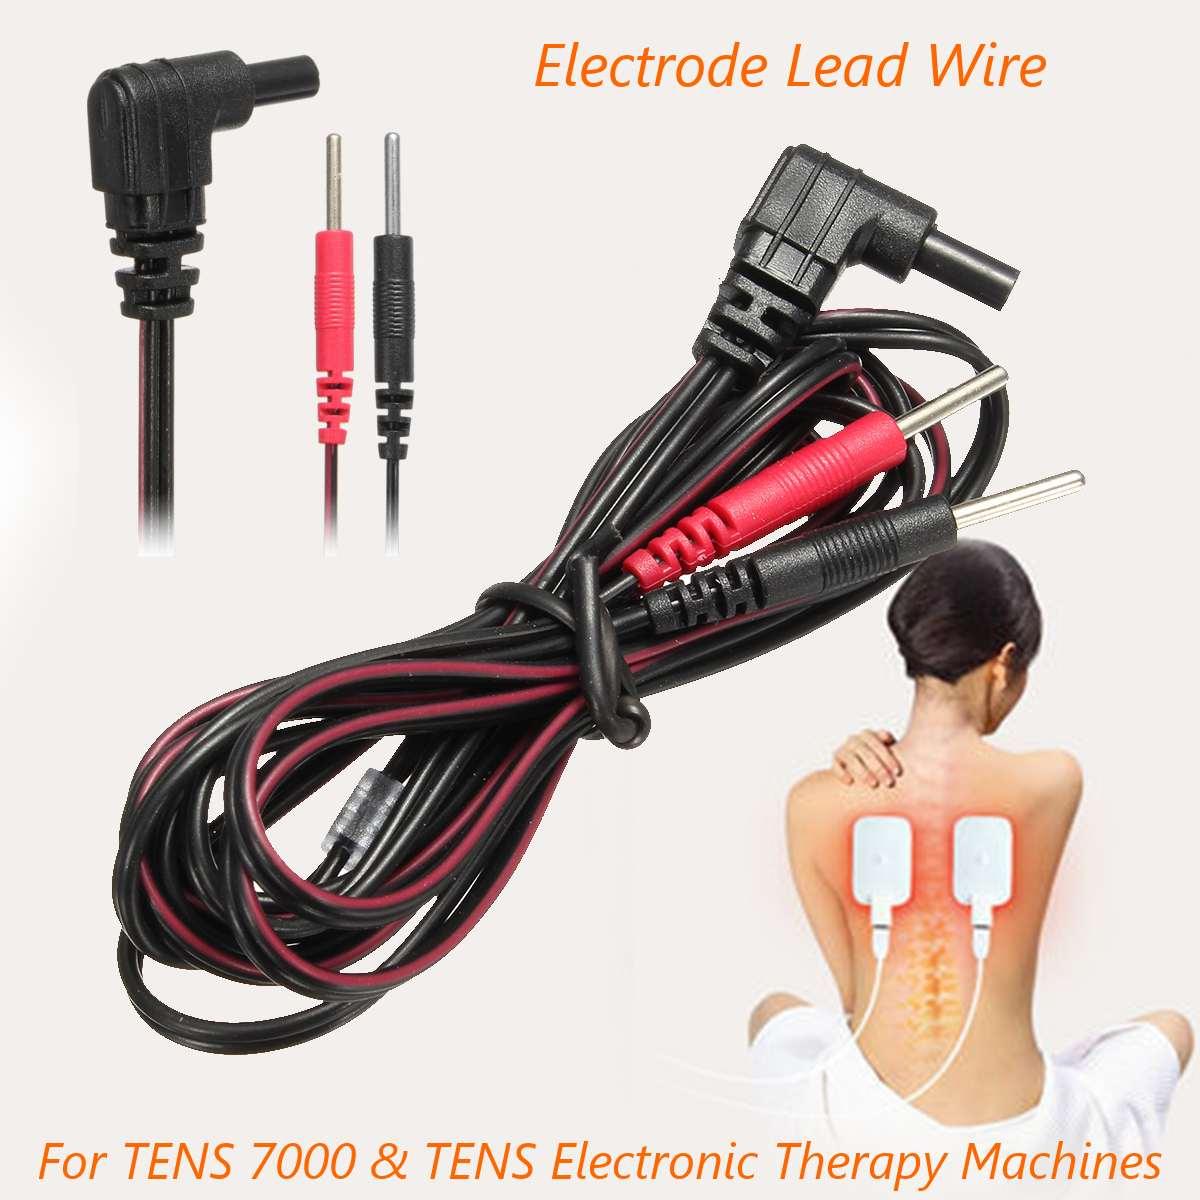 1 Pc Ersatz Elektrode Blei Drähte Standard Pin Anschluss Kabel 2mm Kompatibel Für ZEHN 7000 Digitale Therapie Massage Maschine